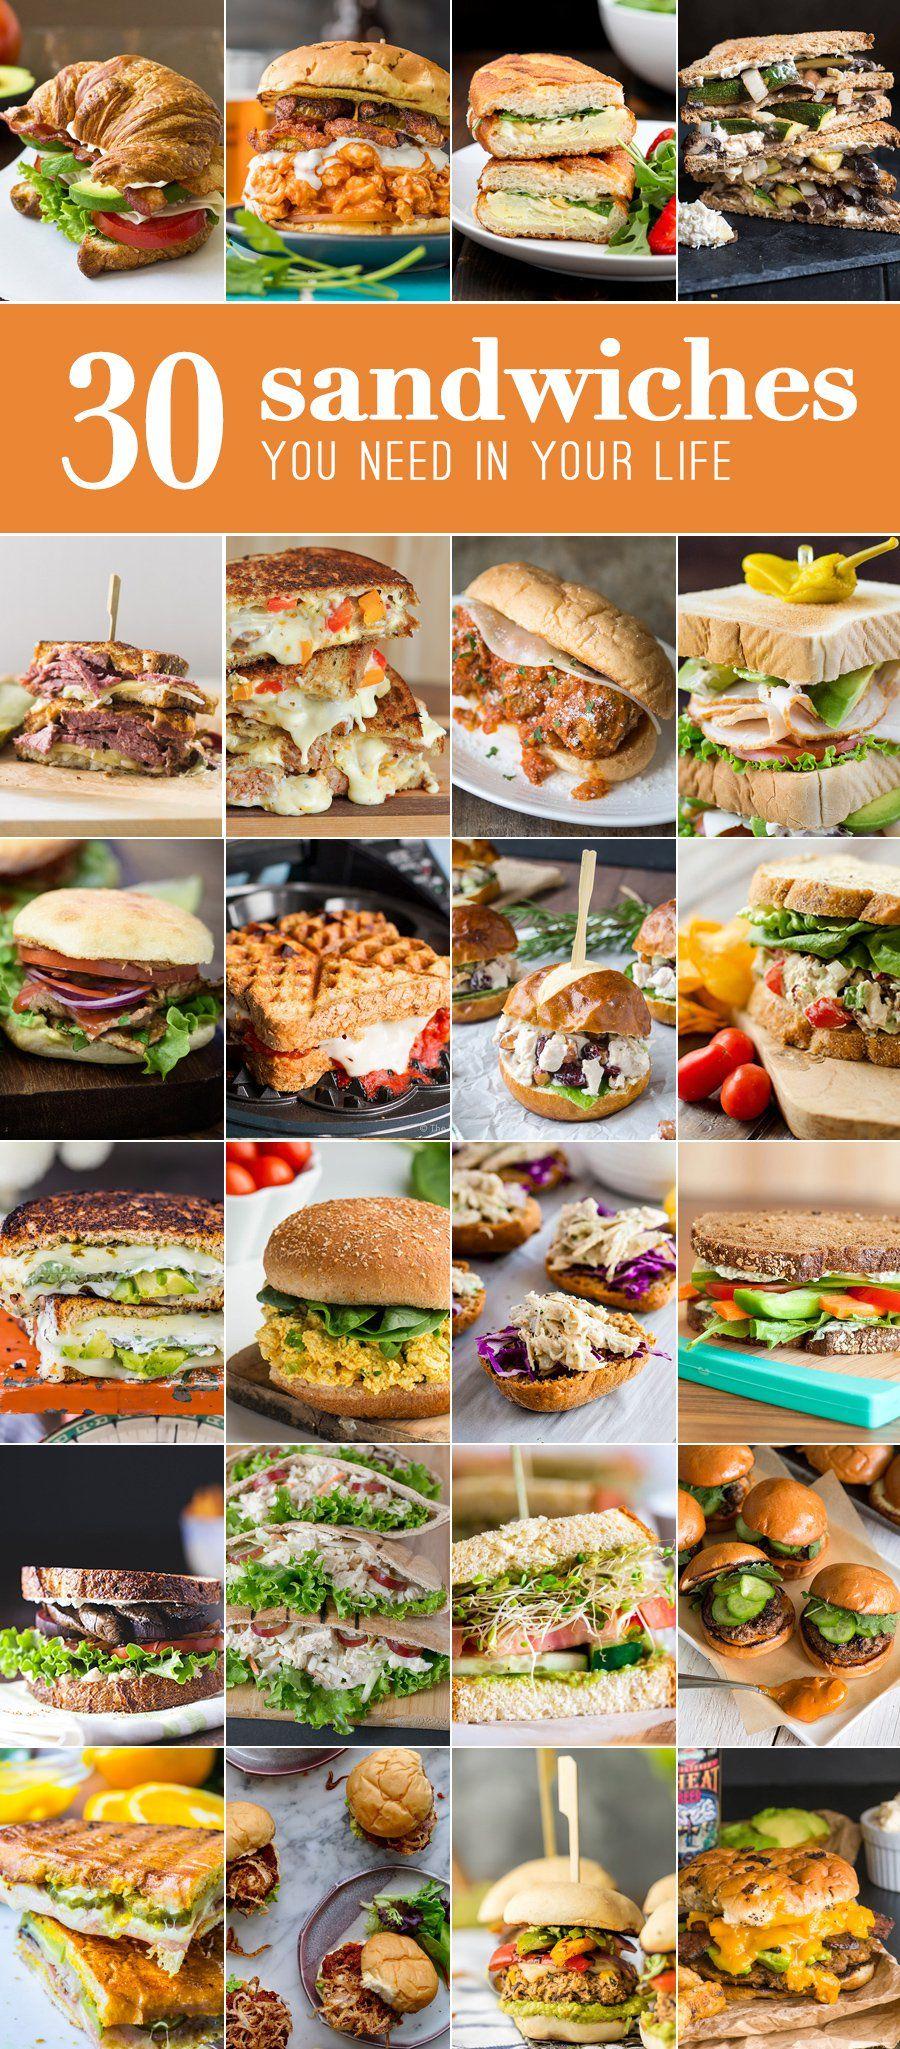 10 Sandwich Recipes #sandwichrecipes